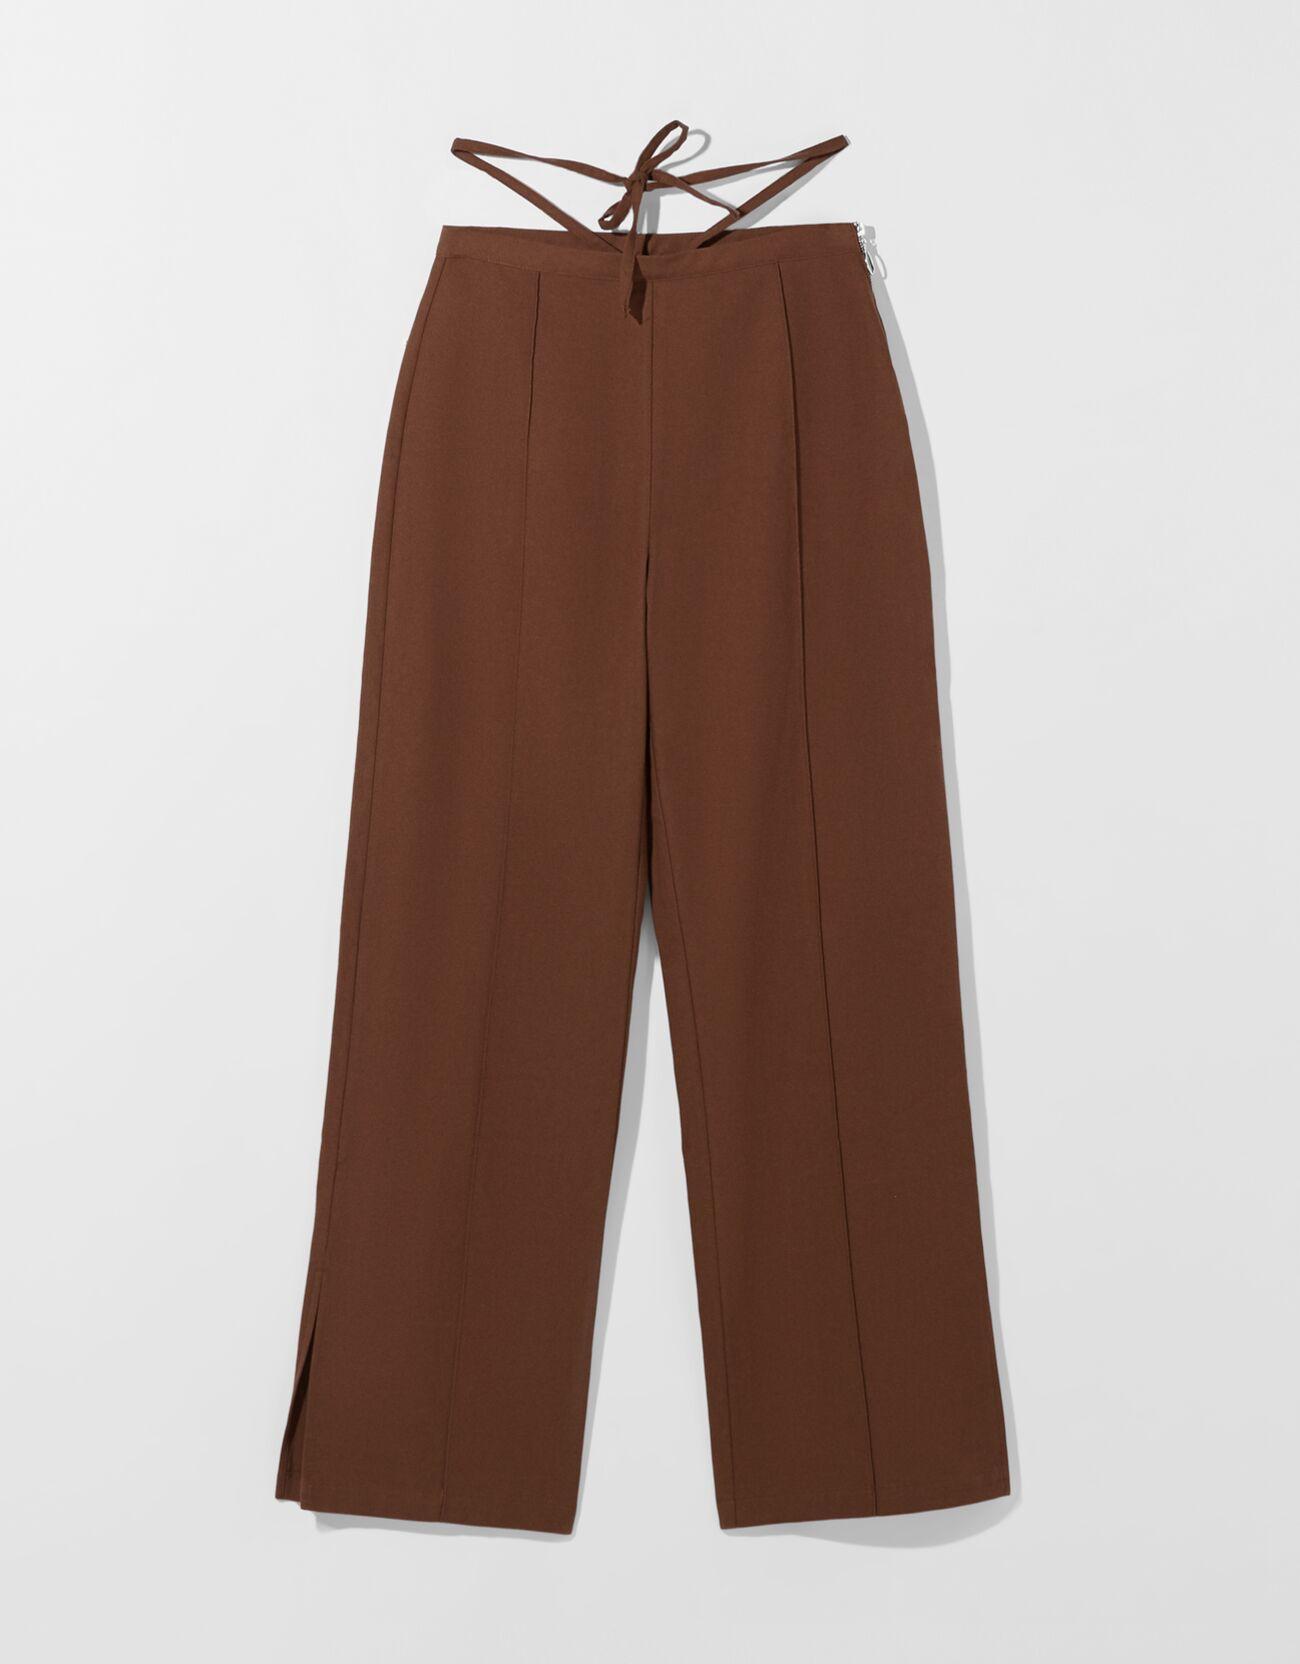 Pantalón algodón straight tiras.